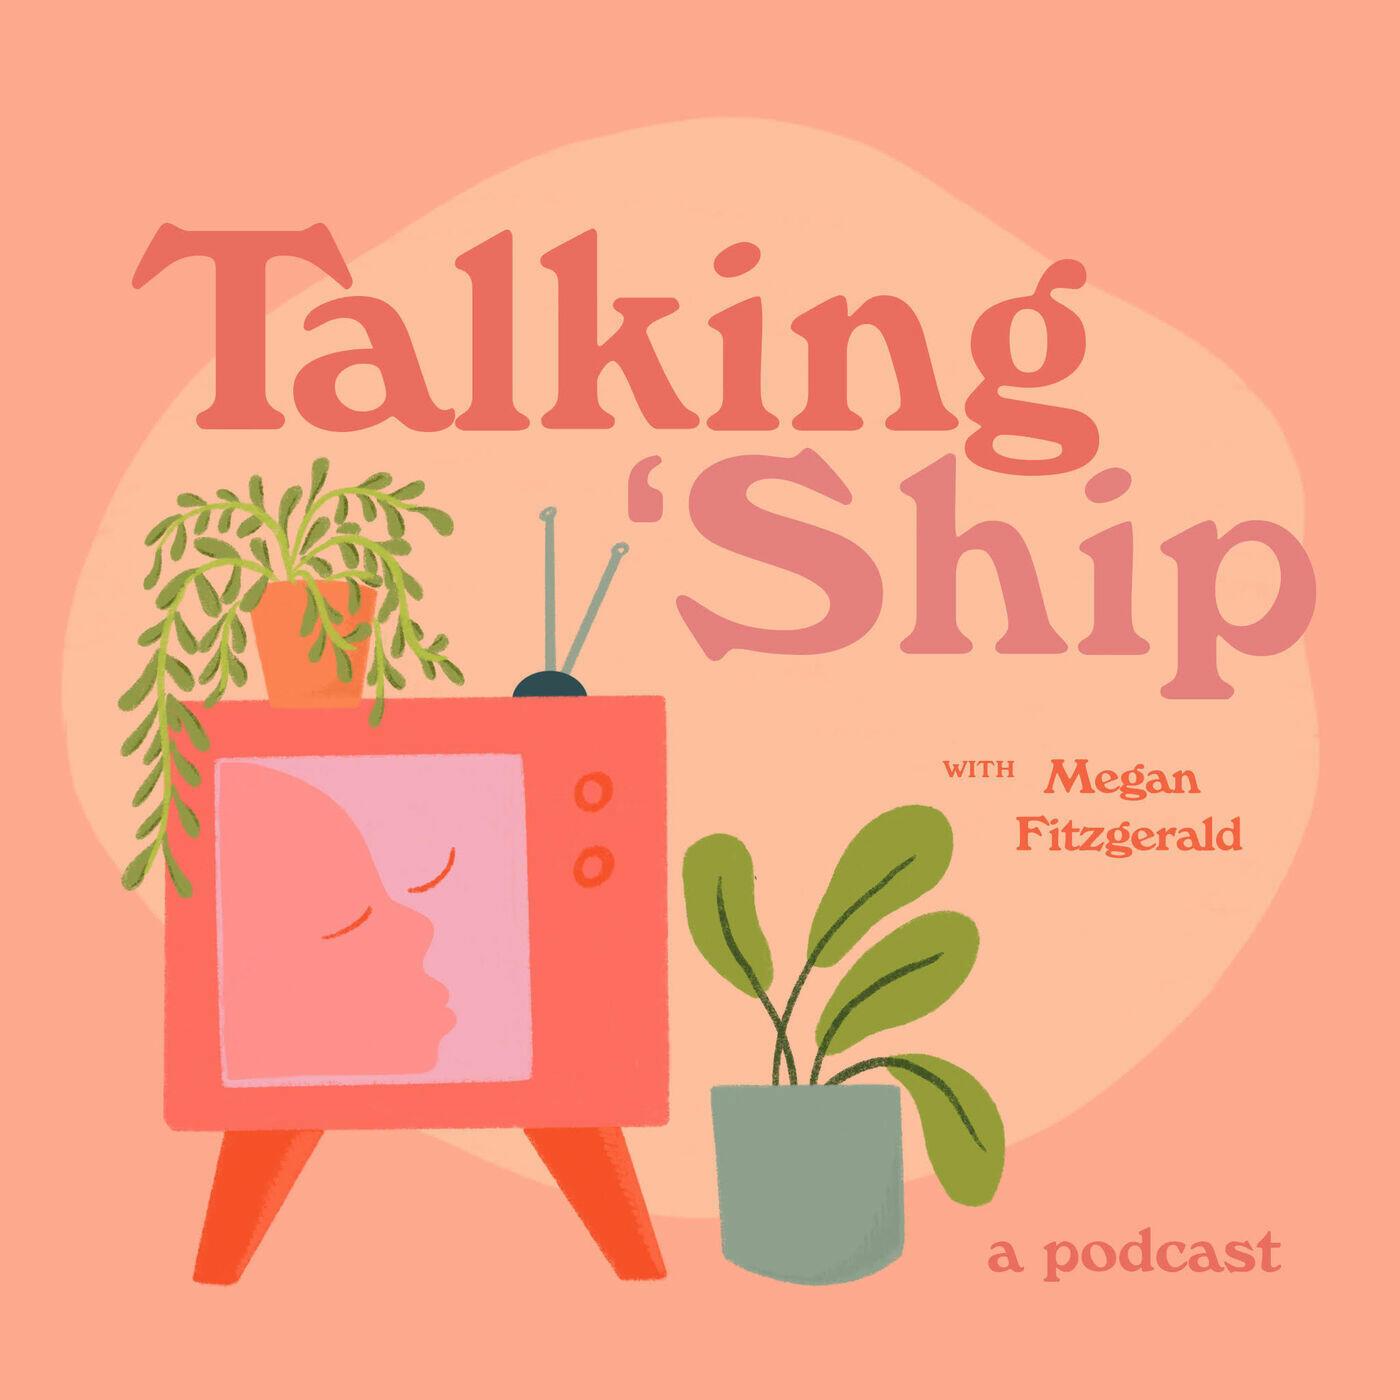 Talking 'Ship